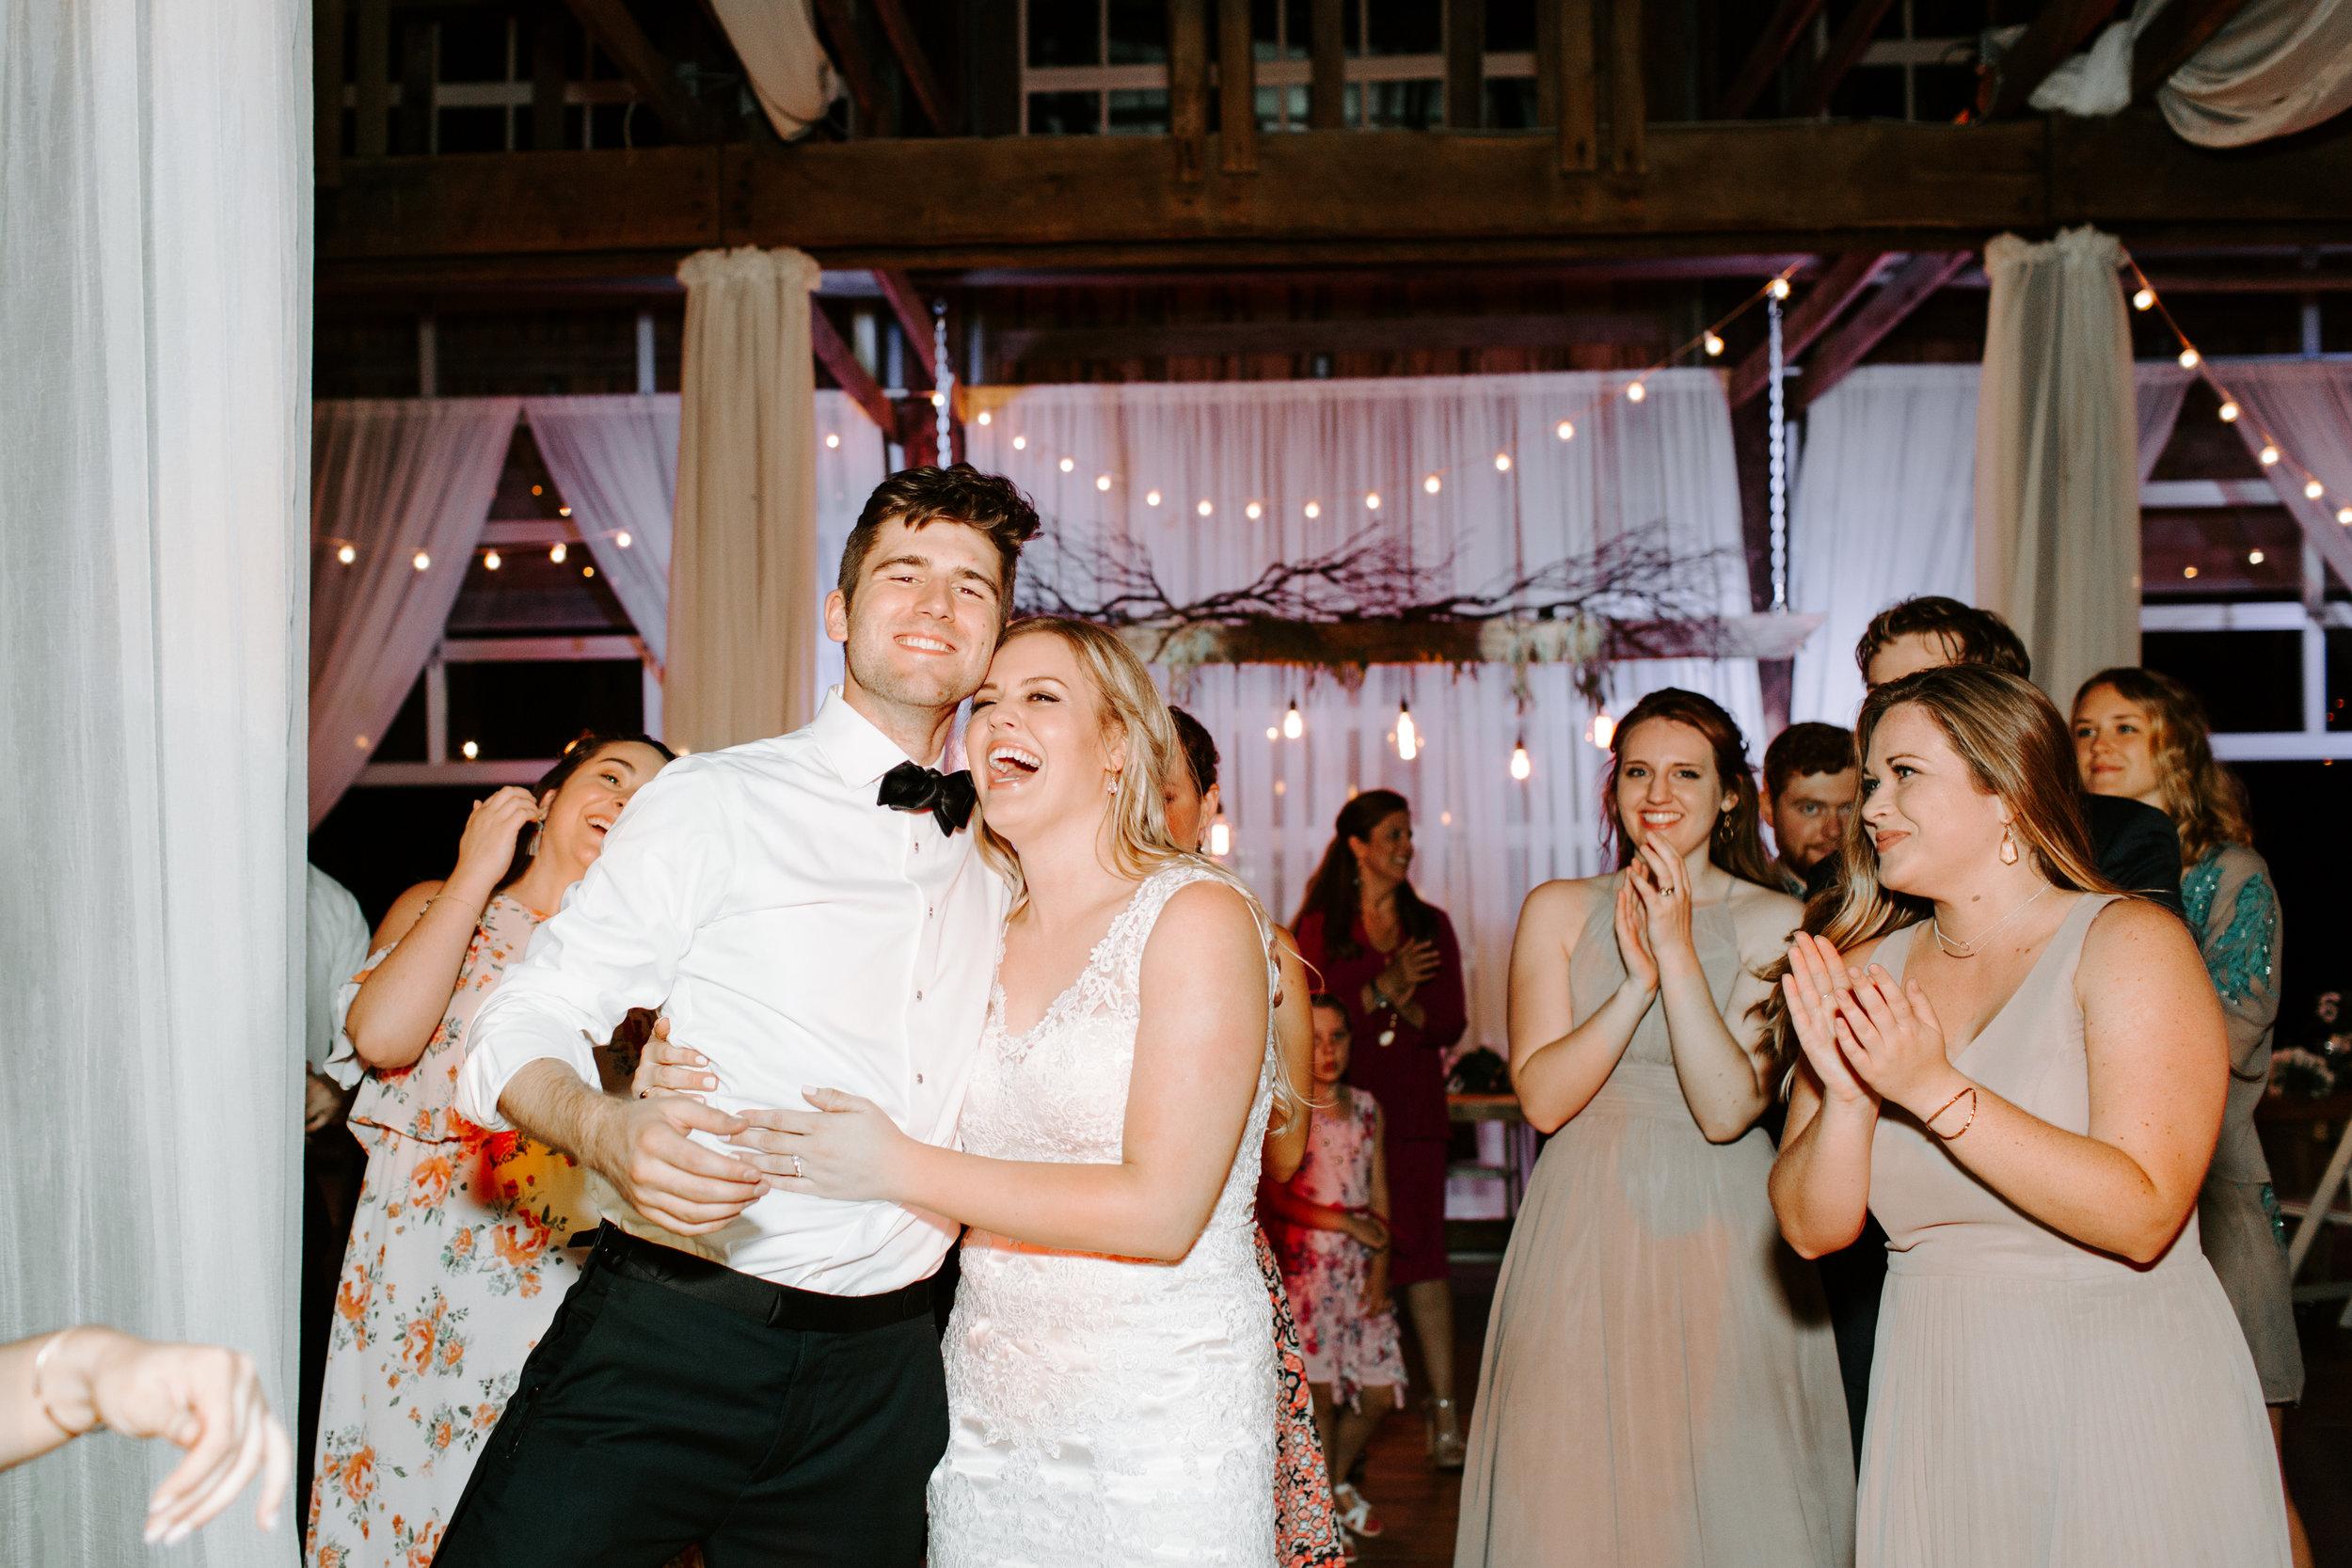 knoxville-wedding-photographer-258.JPG